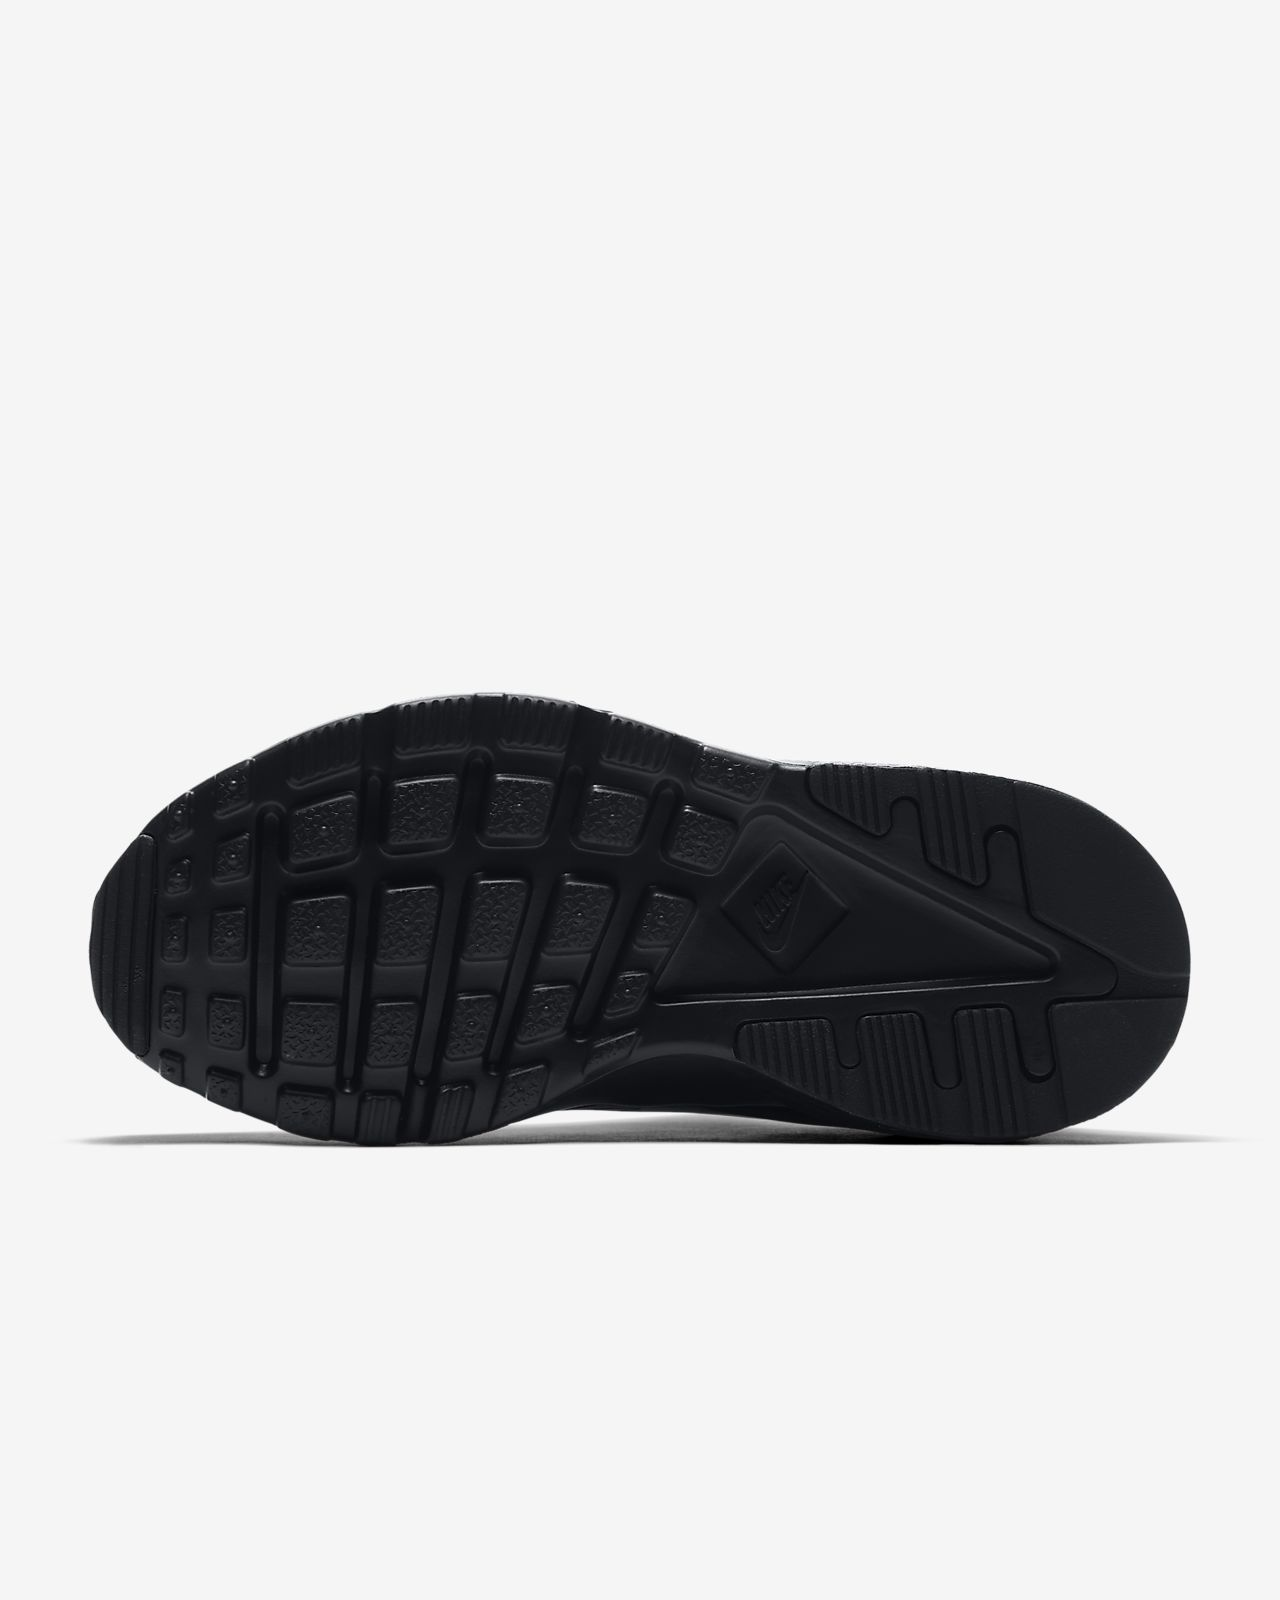 Schuh Kinder Nike Ultra für Huarache jüngere qUpSzMVG